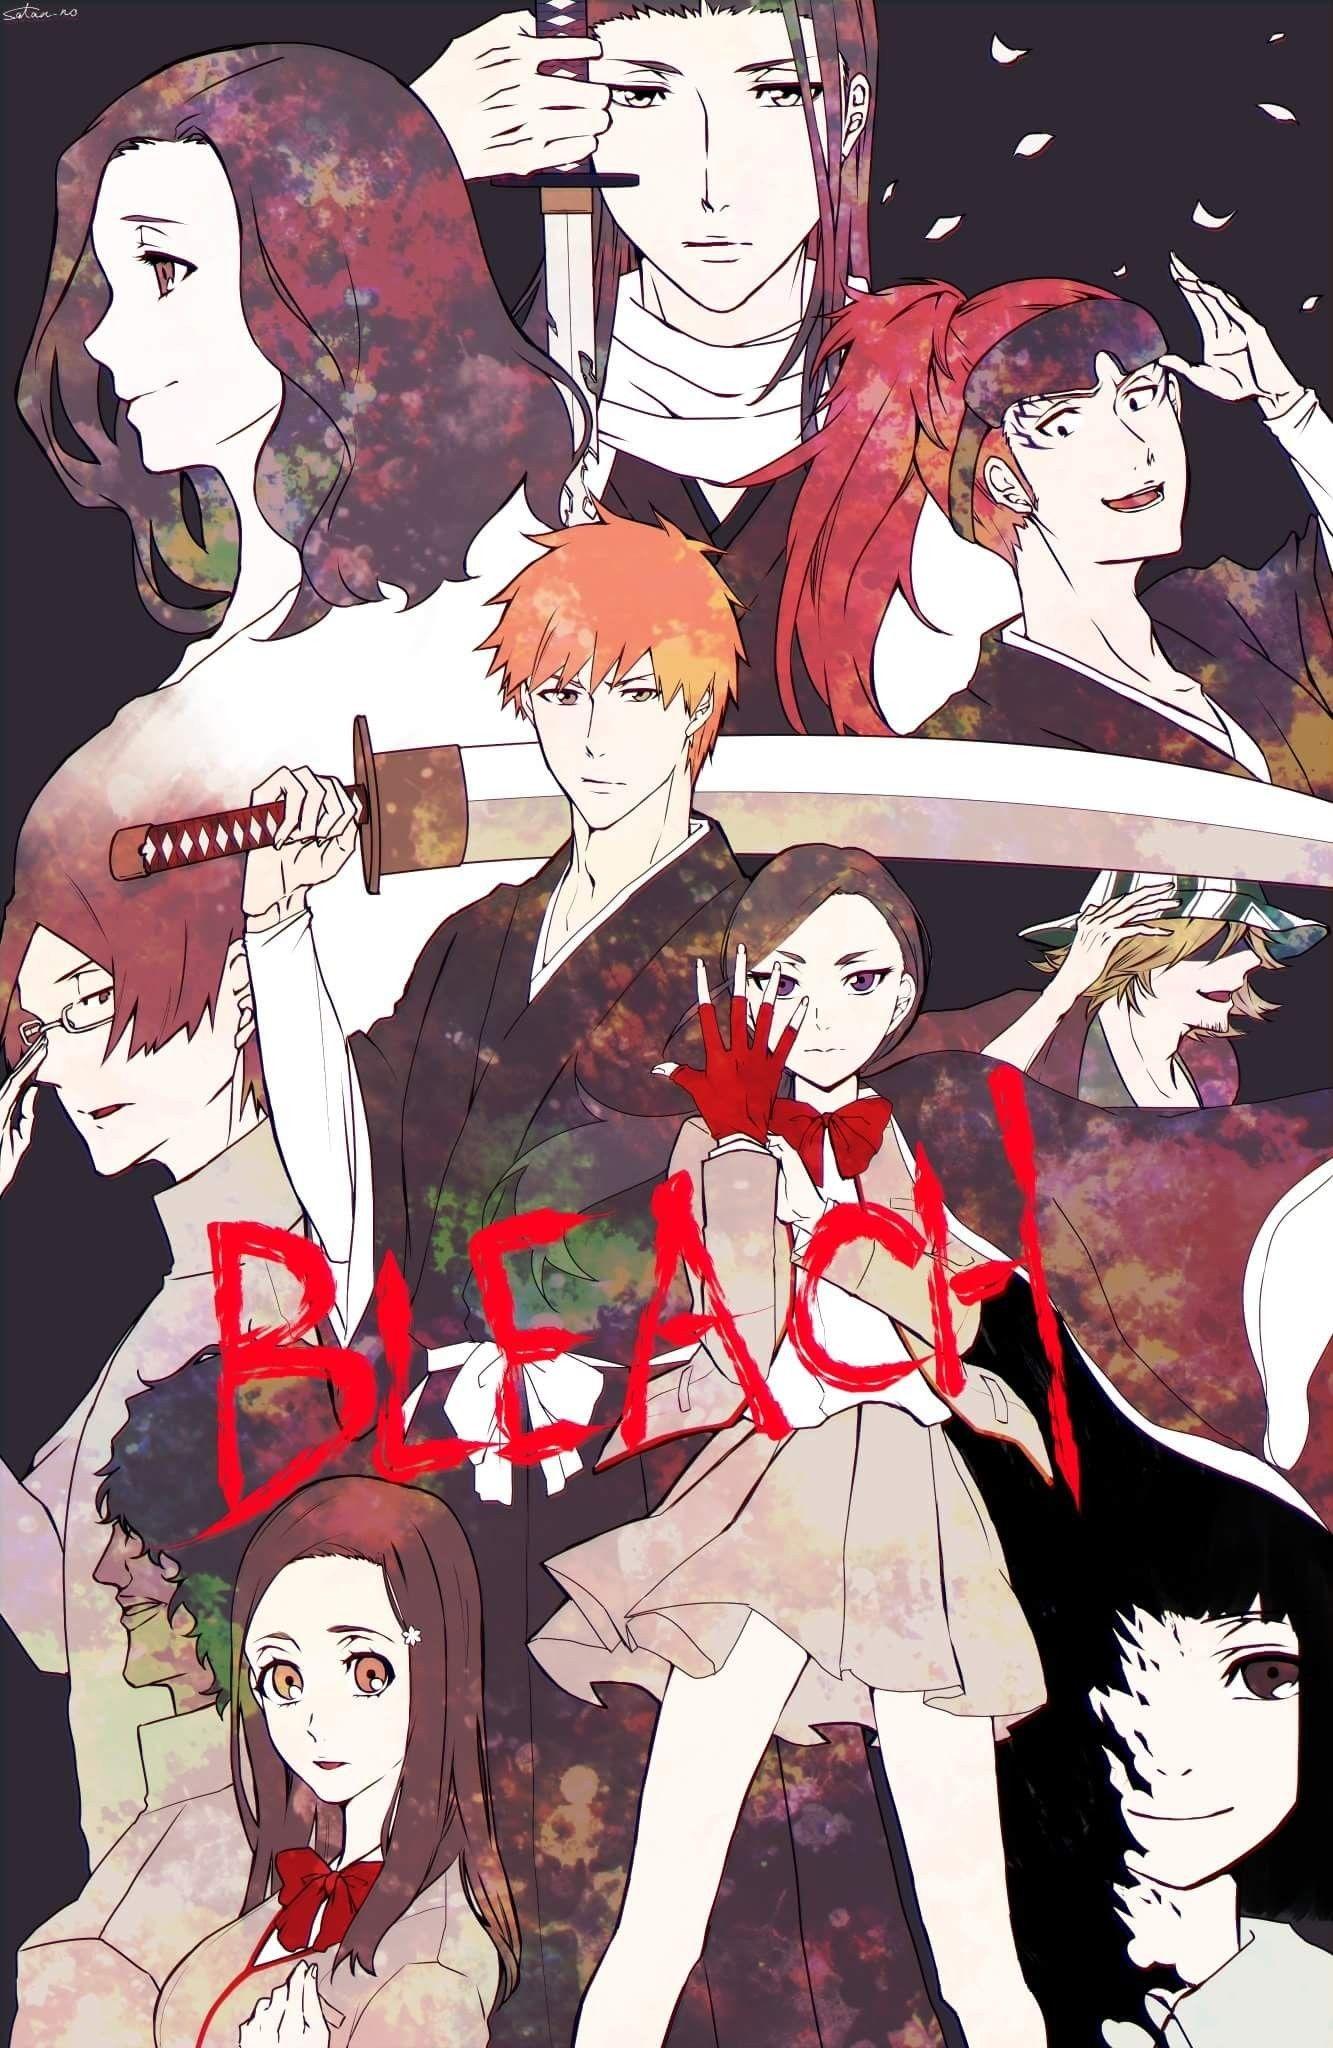 Pin by Evie on Bleach Bleach movie, Bleach anime, Anime